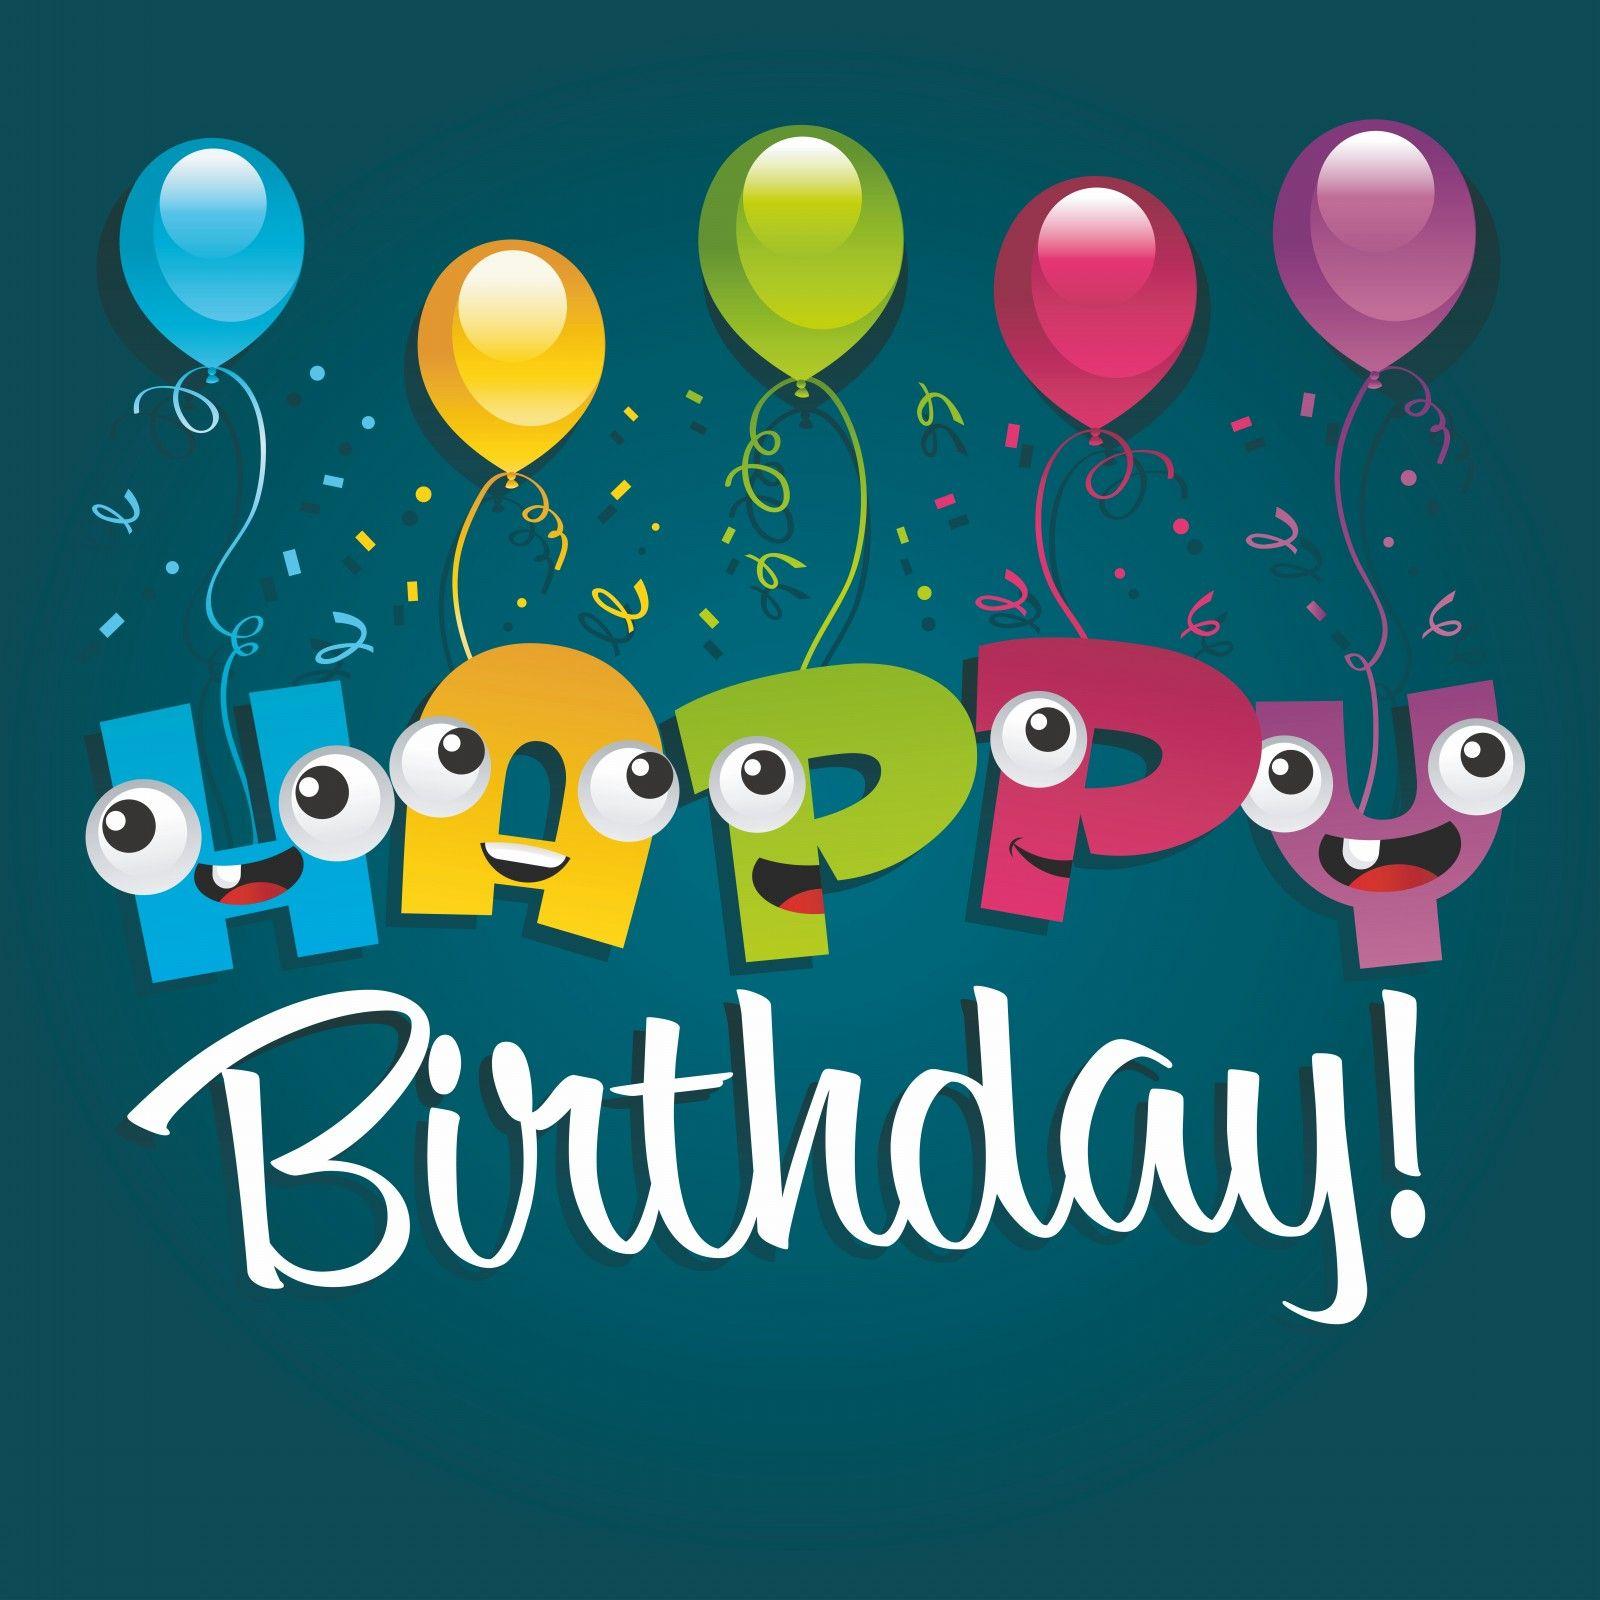 HappyBirthdayGreetingCardDesignFunnycartoonCharactersjpg – Birthday Greeting Designs